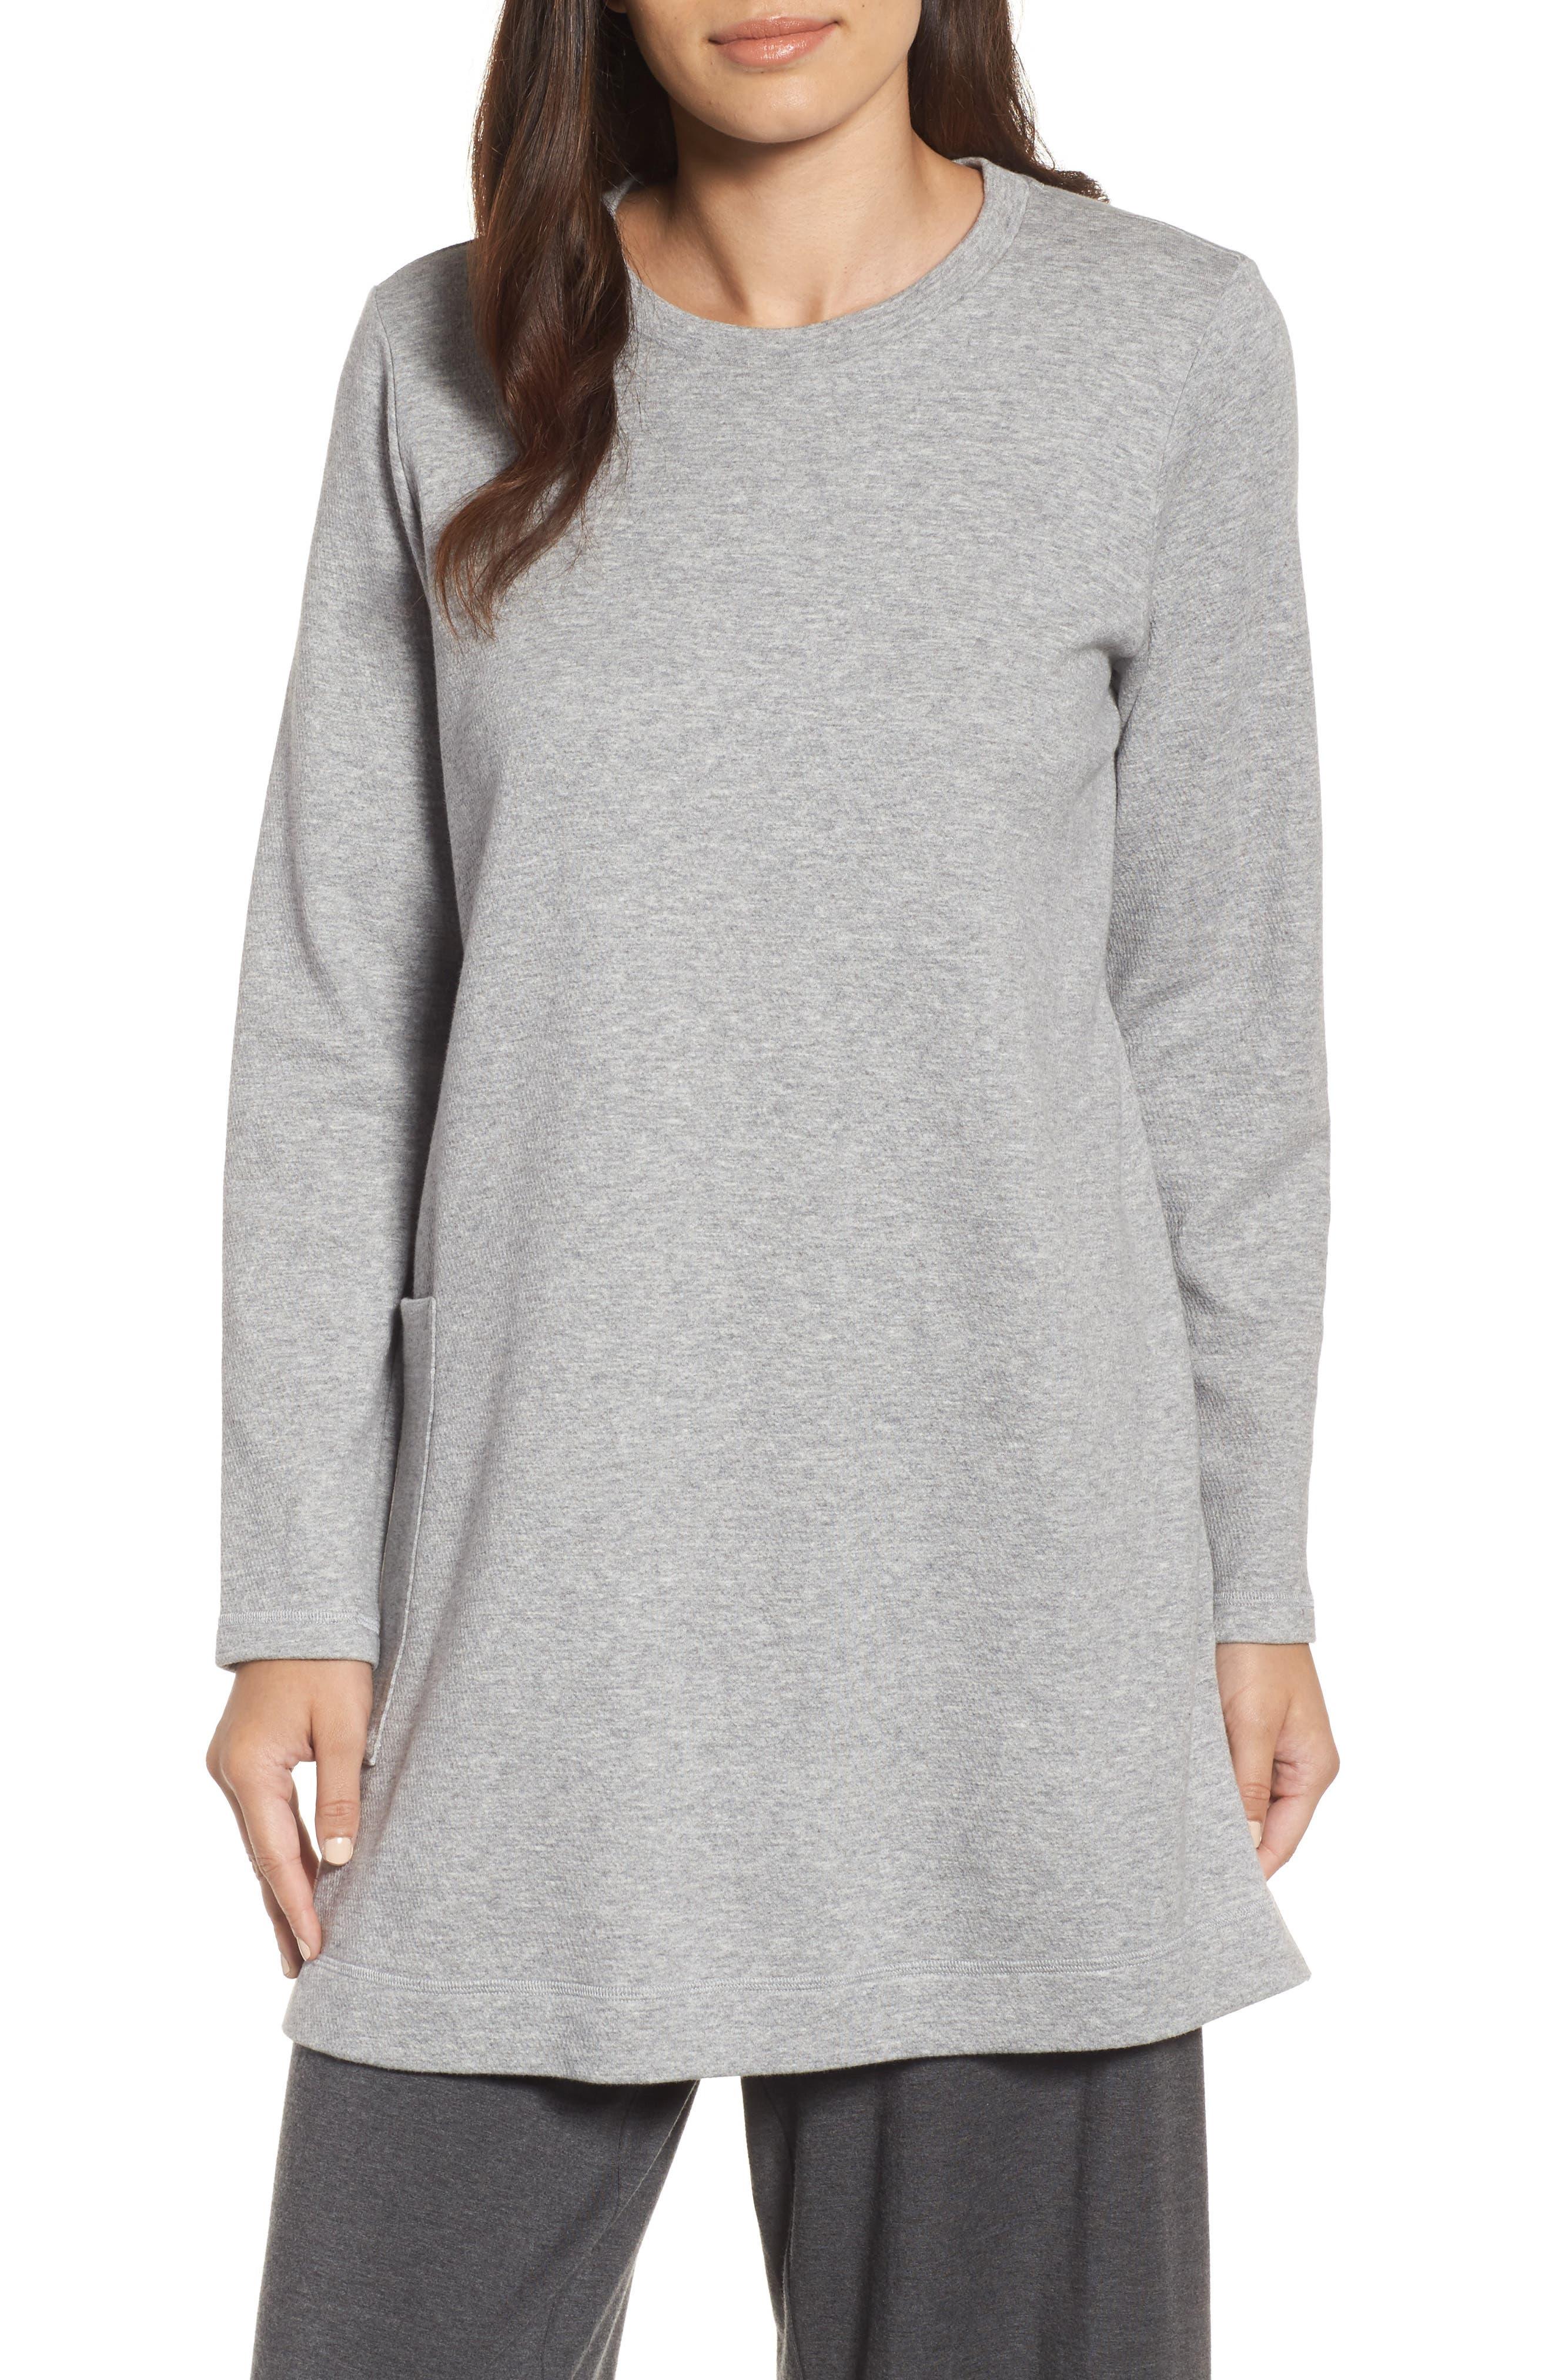 Double Knit Organic Cotton Tunic,                         Main,                         color, 022